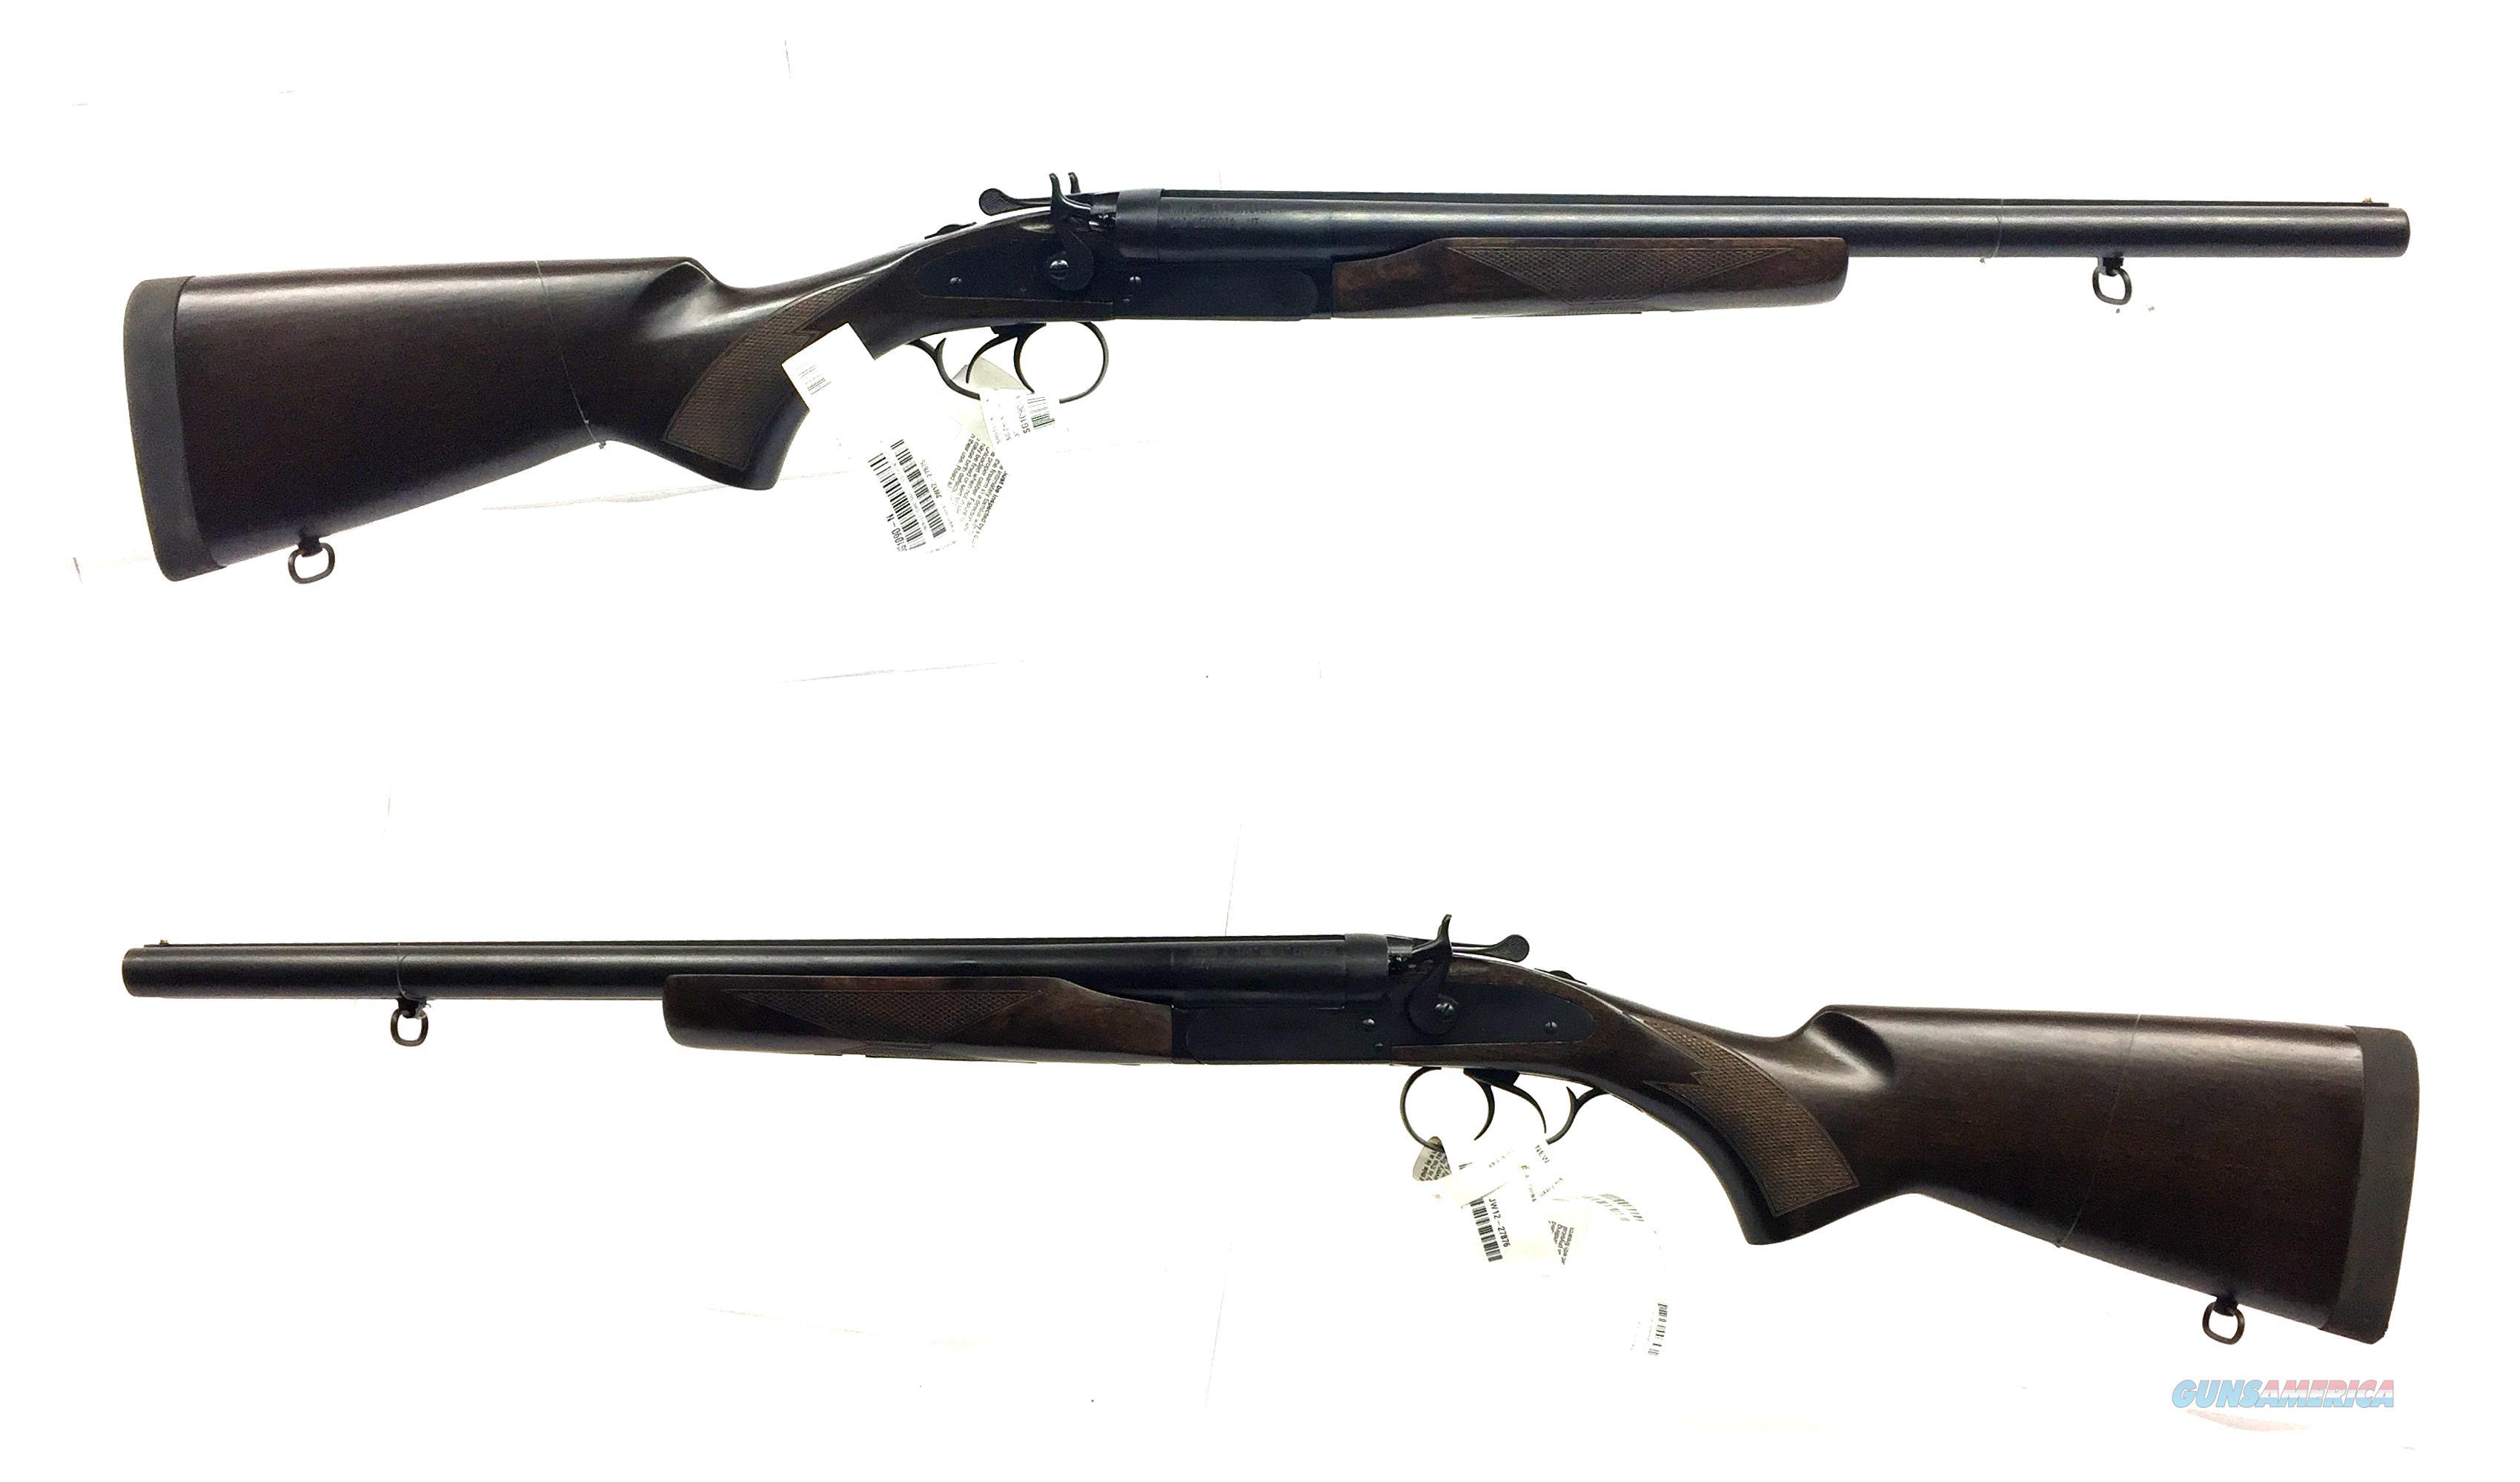 Zhong Zhou JW-2000 12GA SxS Shotgun  Guns > Shotguns > Century International Arms - Shotguns > Shotguns